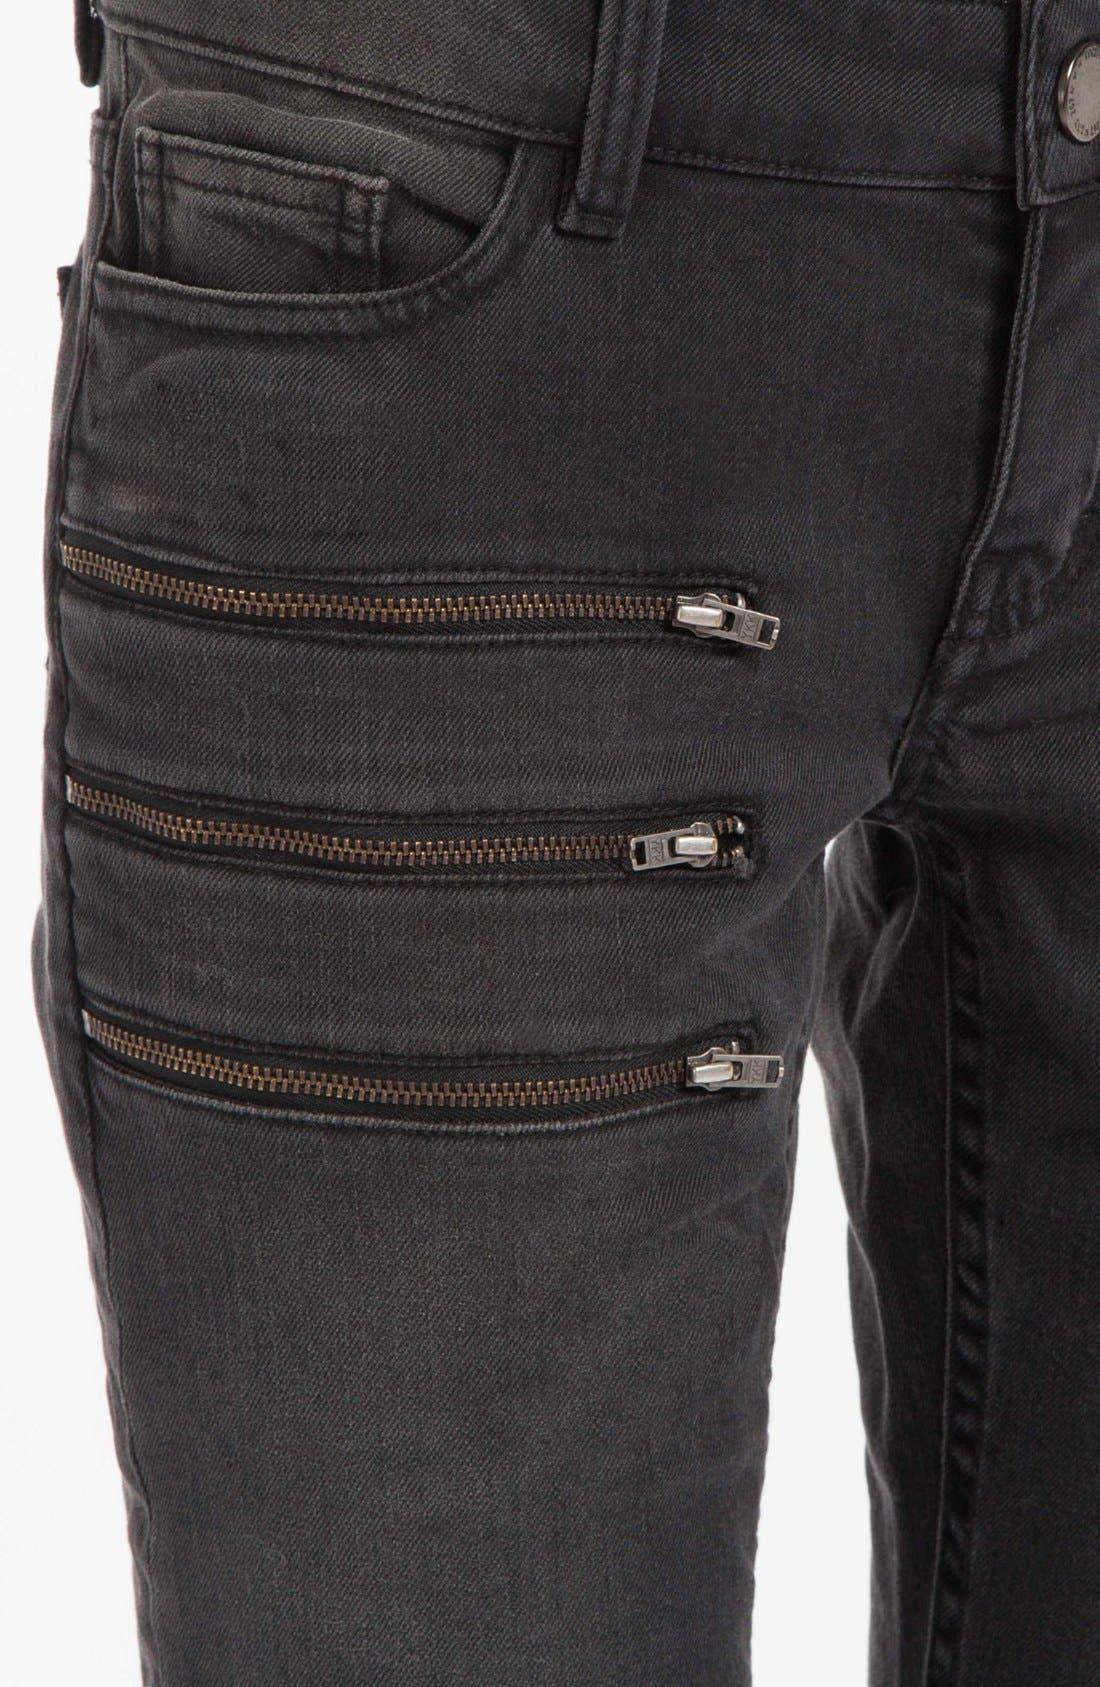 Alternate Image 3  - maje 'Dip' Colored Skinny Jeans (Noir)